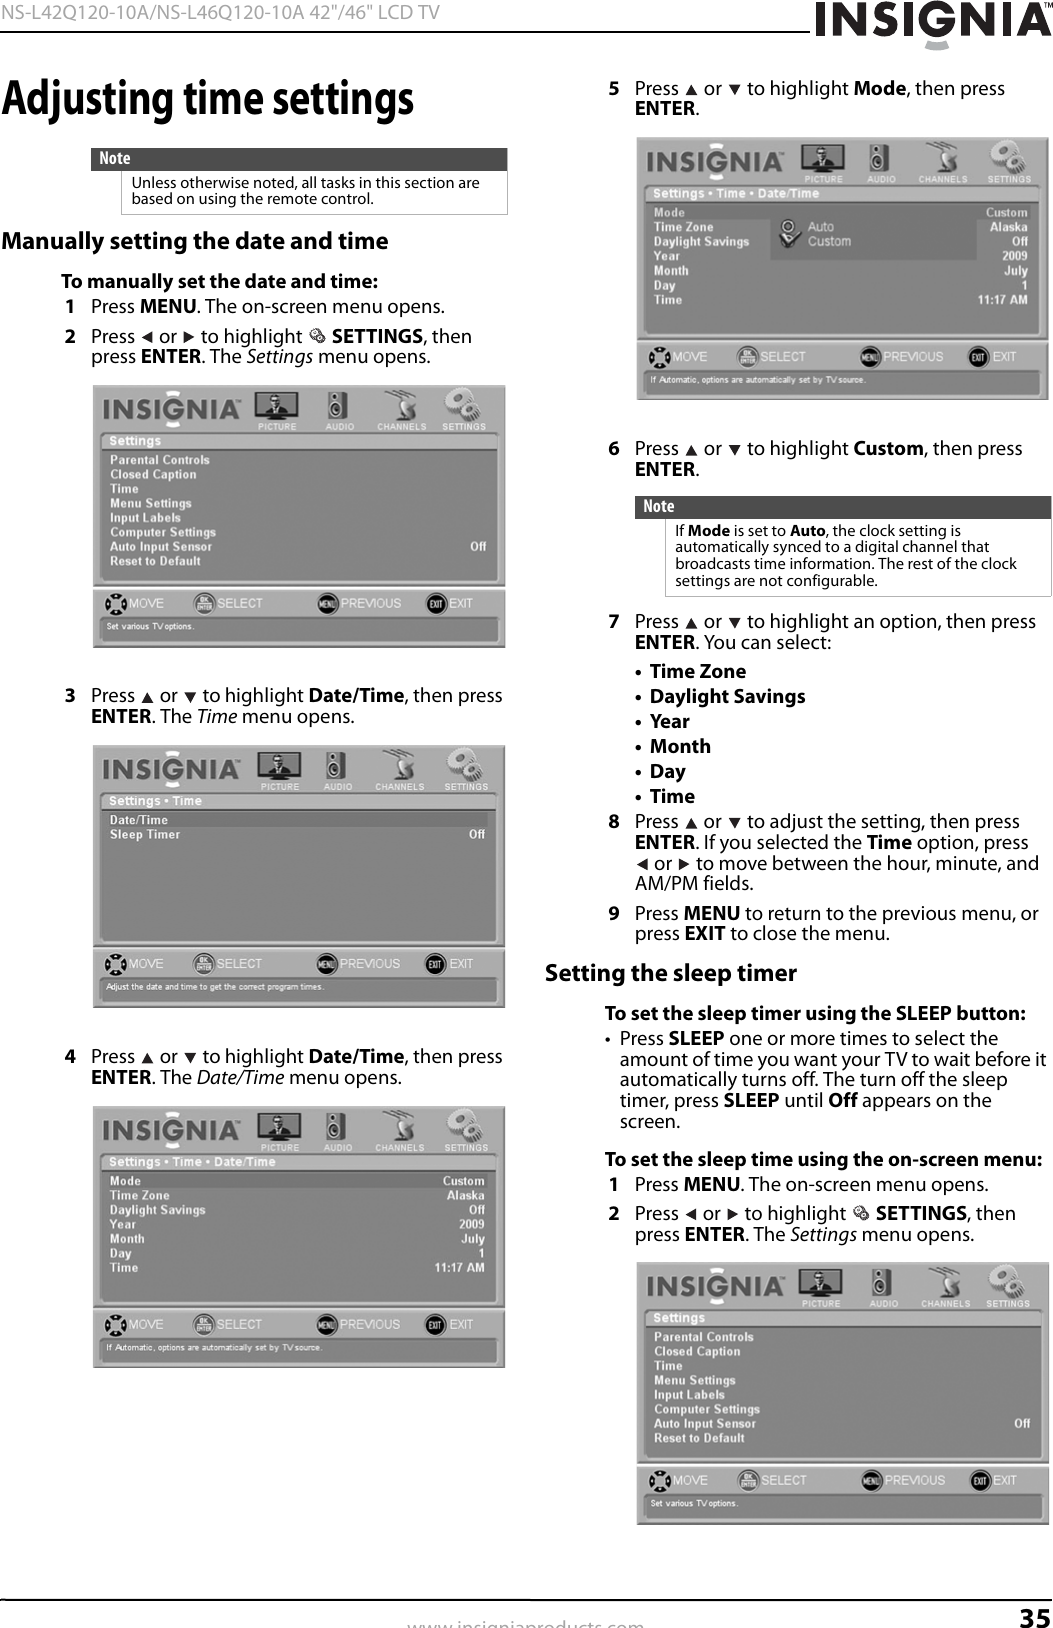 Insignia Ns L42Q120 10A Users Manual